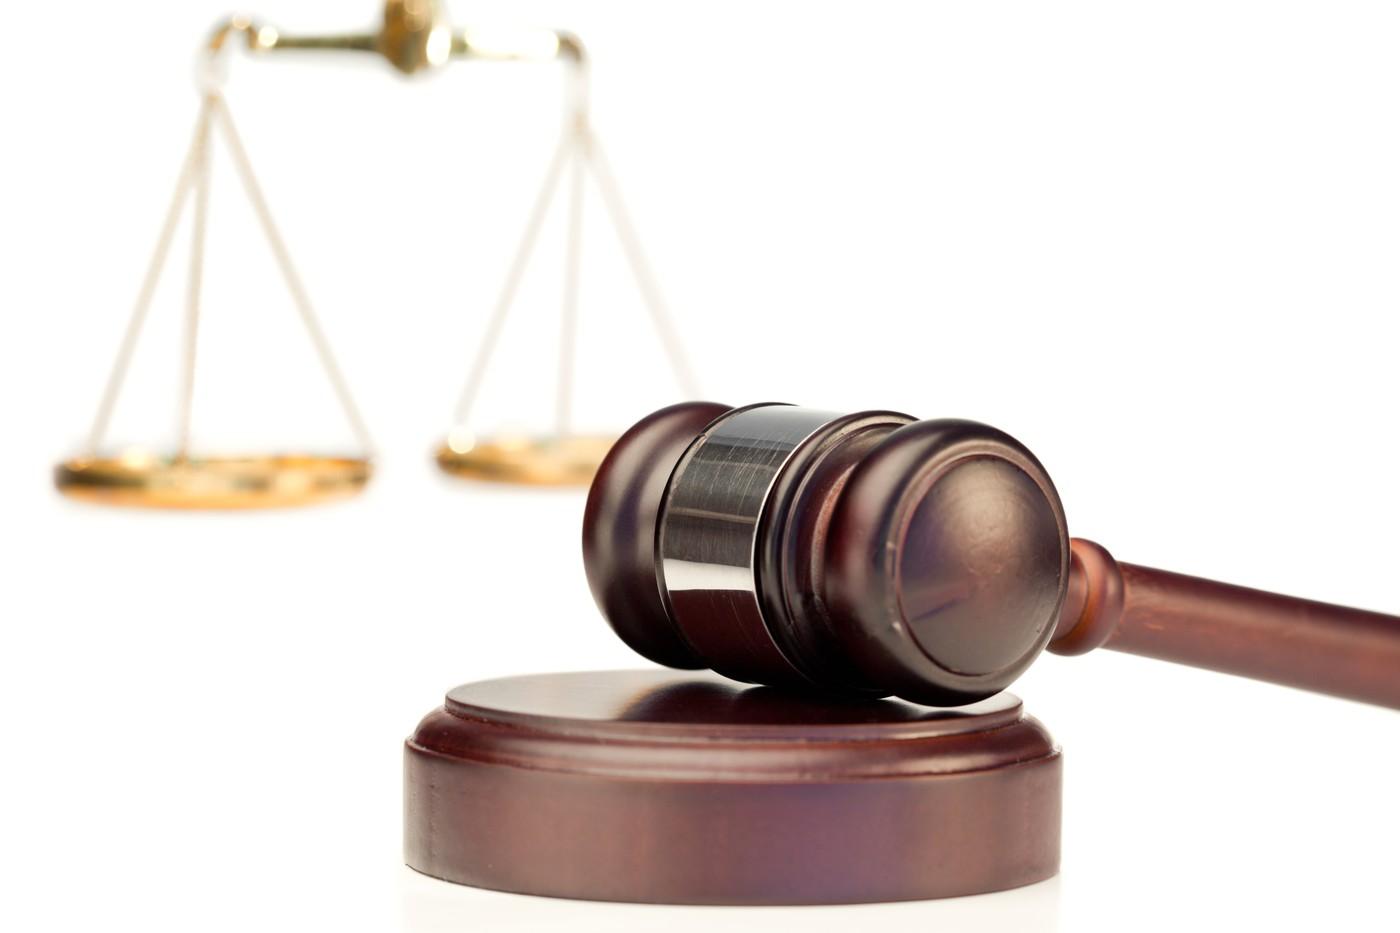 Remiziju Šalji smanjena kazna za ratni zločin